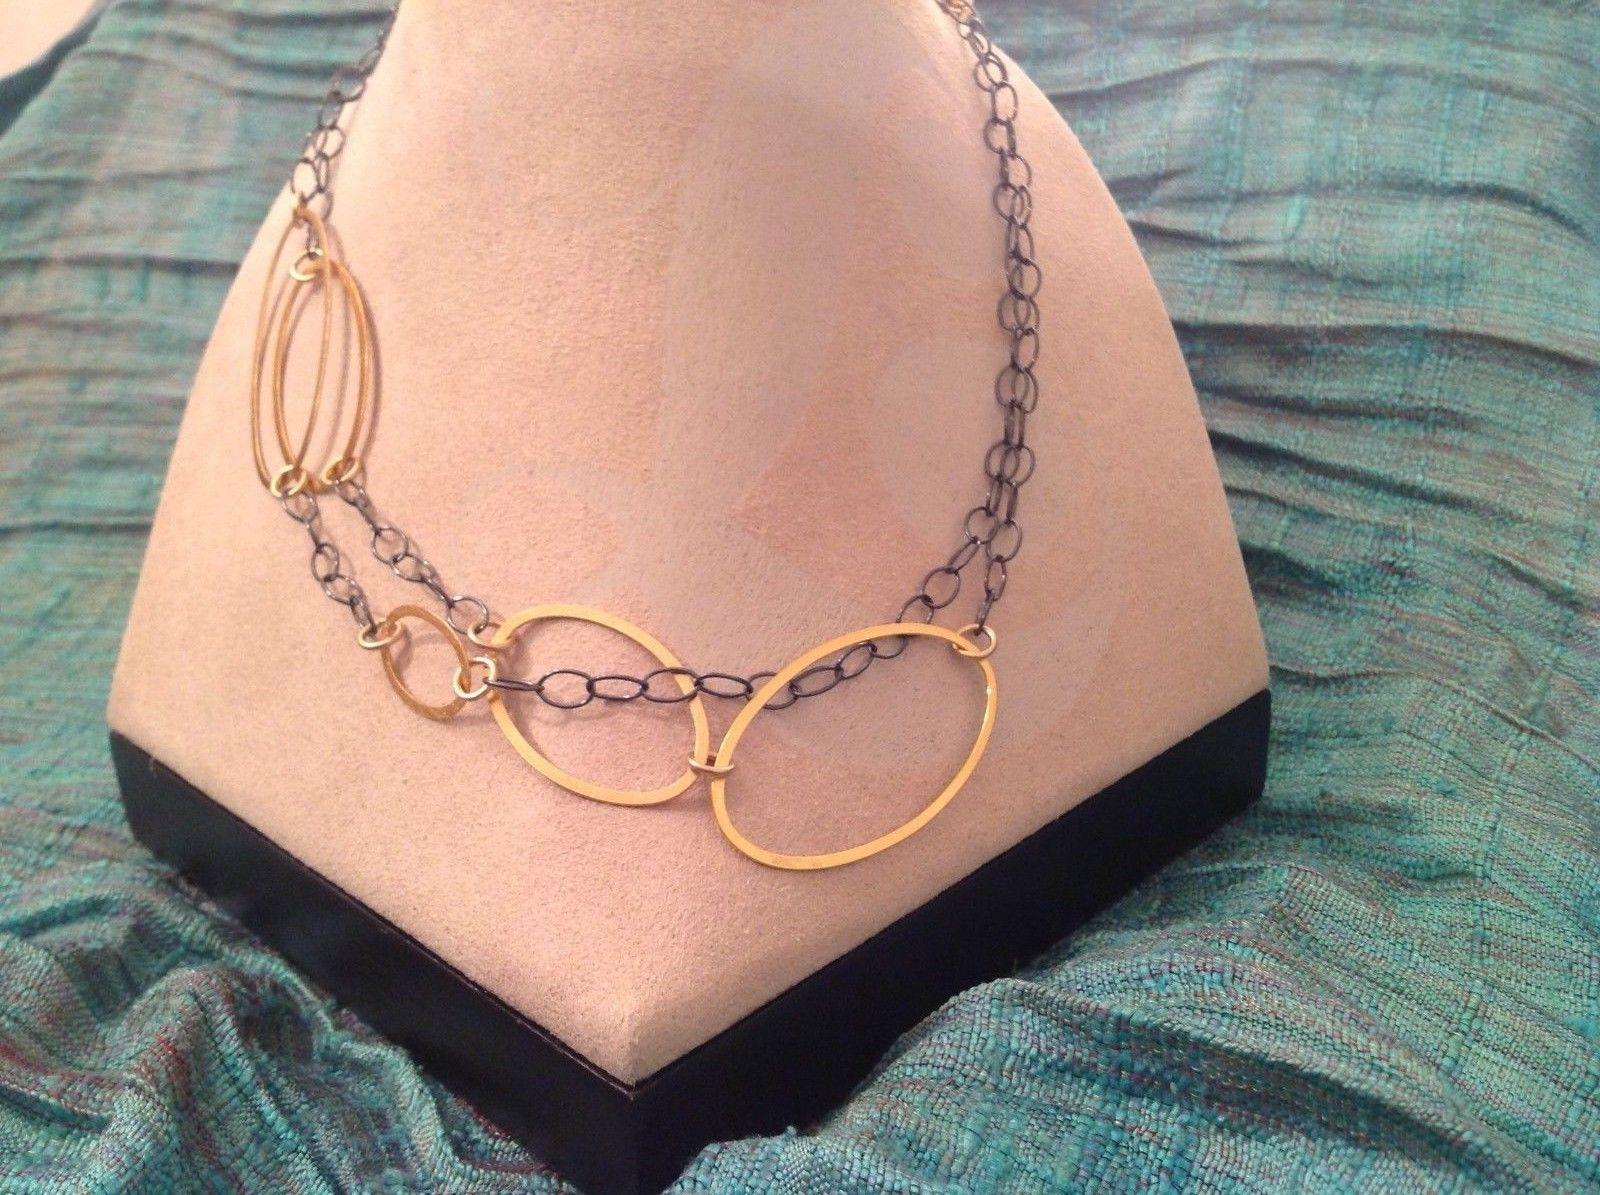 Long Multi Oval Necklace Gold w Black Oxide Silver Chain Handmade Zina Kao